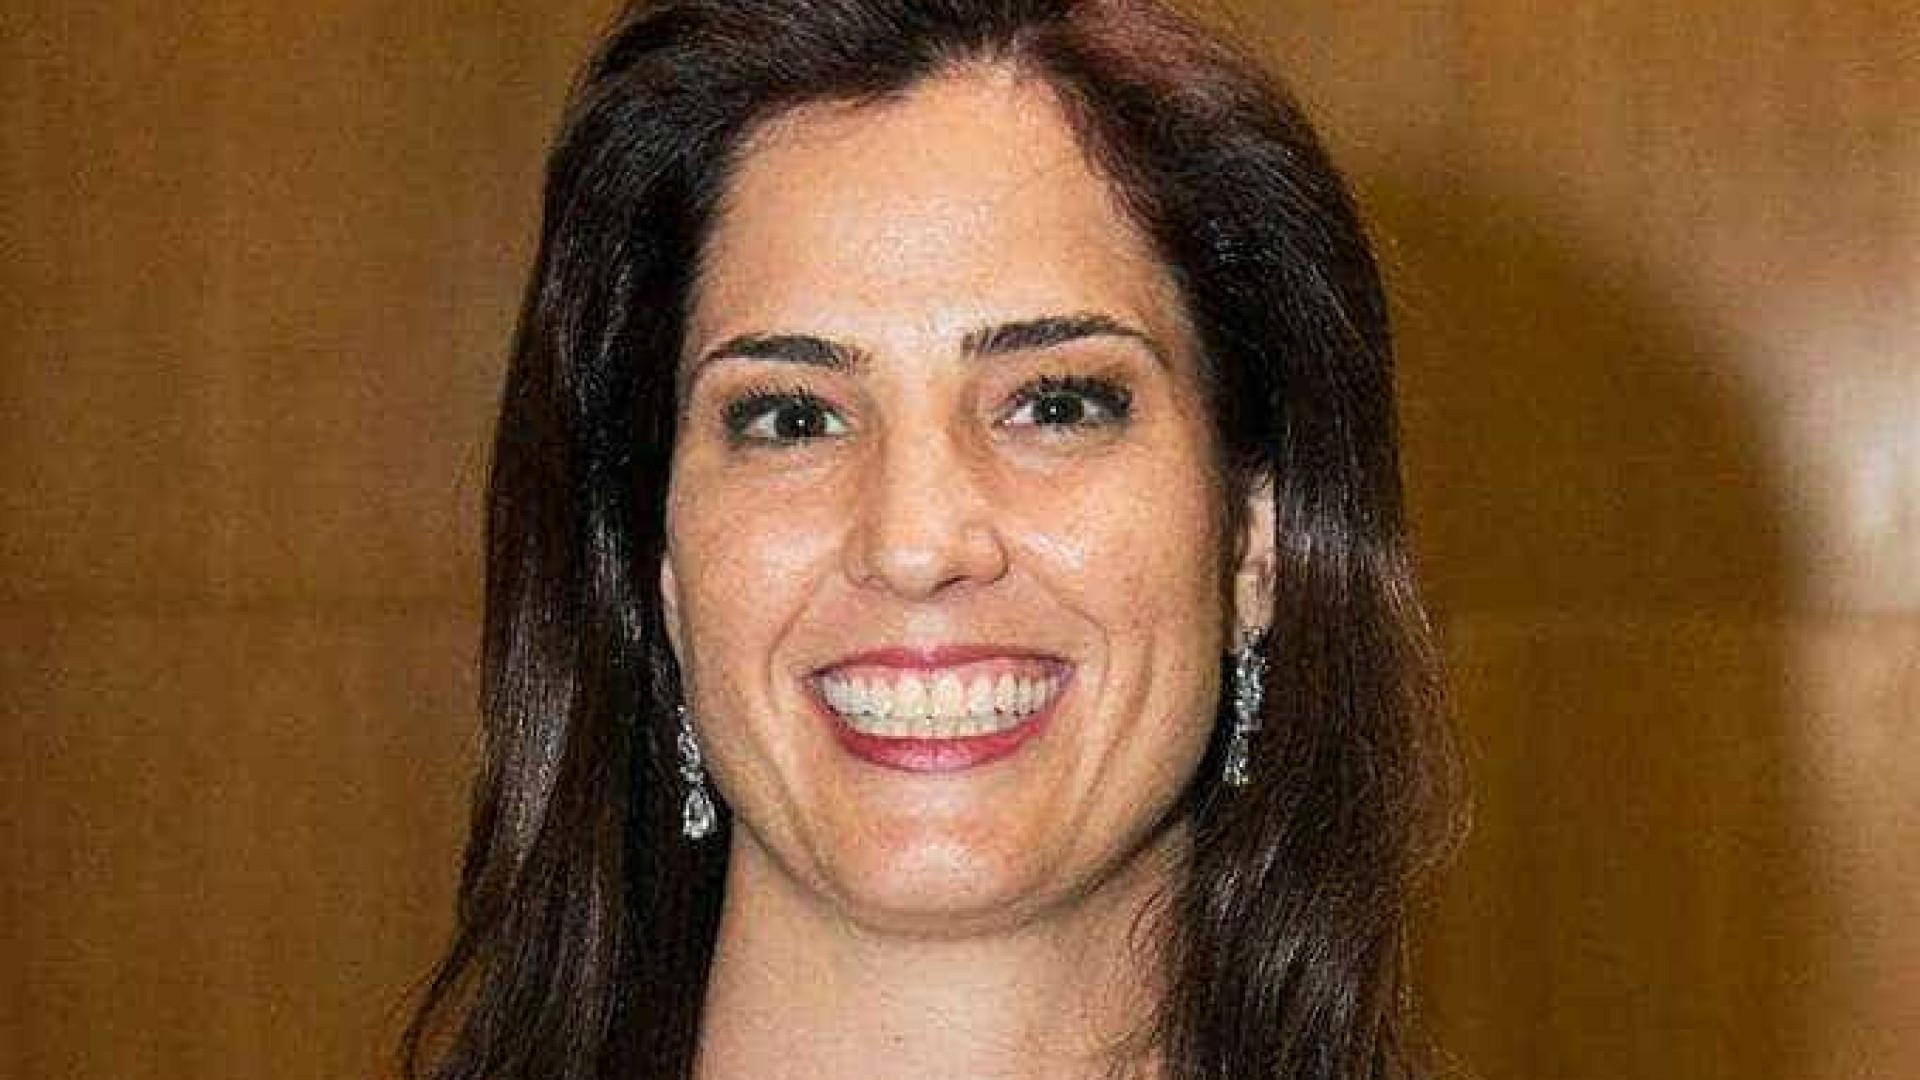 Conheça Gabriela Hardt, substituta de Moro em Curitiba